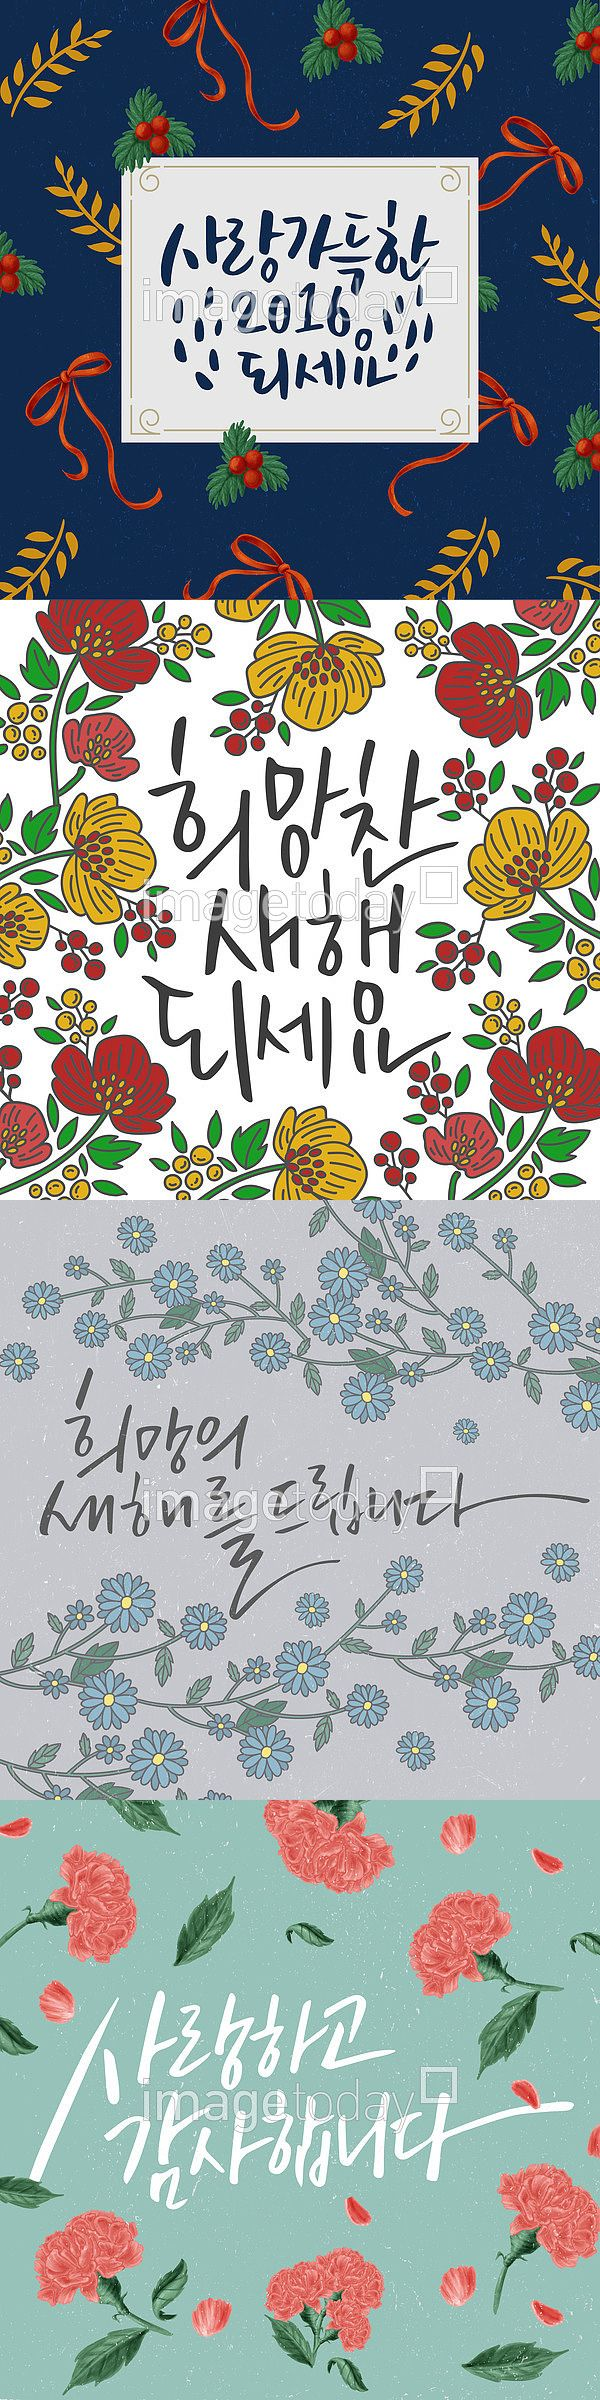 PSD 감사 꽃 꽃잎 레터링 메시지 무늬 문자 백그라운드 블루 빈티지 사람없음 사랑 손글씨 식물 어버이날 카네이션 캘리그래피 페인터 한글 PSD Audit flower petal background blue vintage lettering letters message pattern people plant handwriting No Love Mother's Day carnation Painter Hangul Calligraphy #이미지투데이 #imagetoday #클립아트코리아 #clipartkorea #통로이미지 #tongroimages